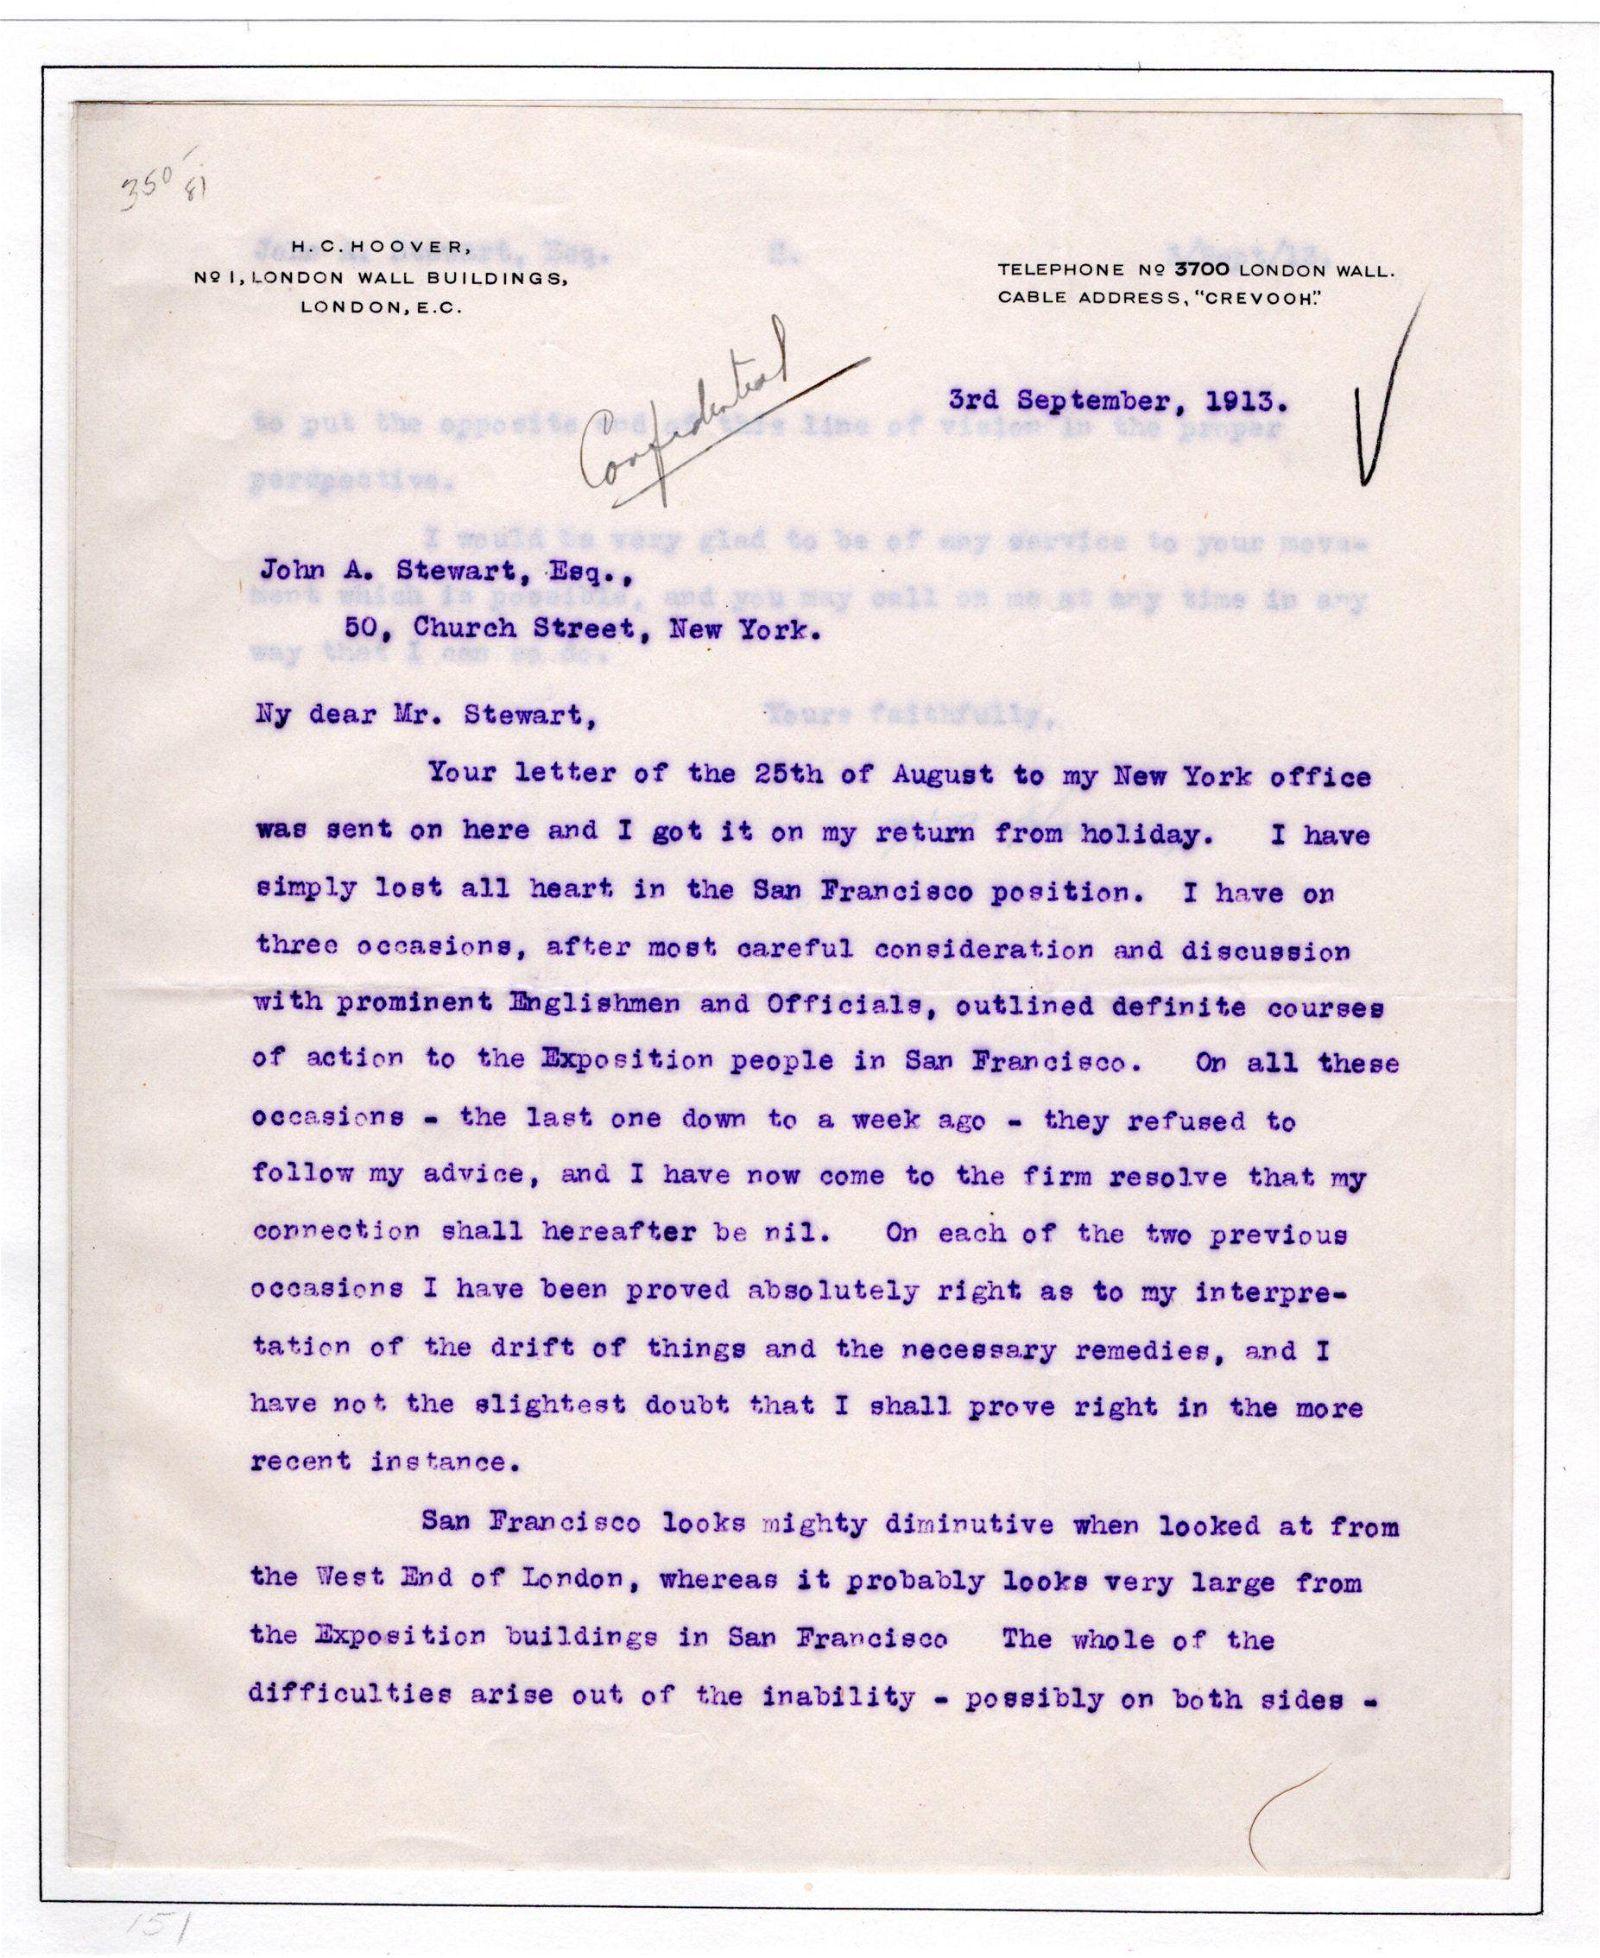 Archive of Five Great Herbert Hoover Items